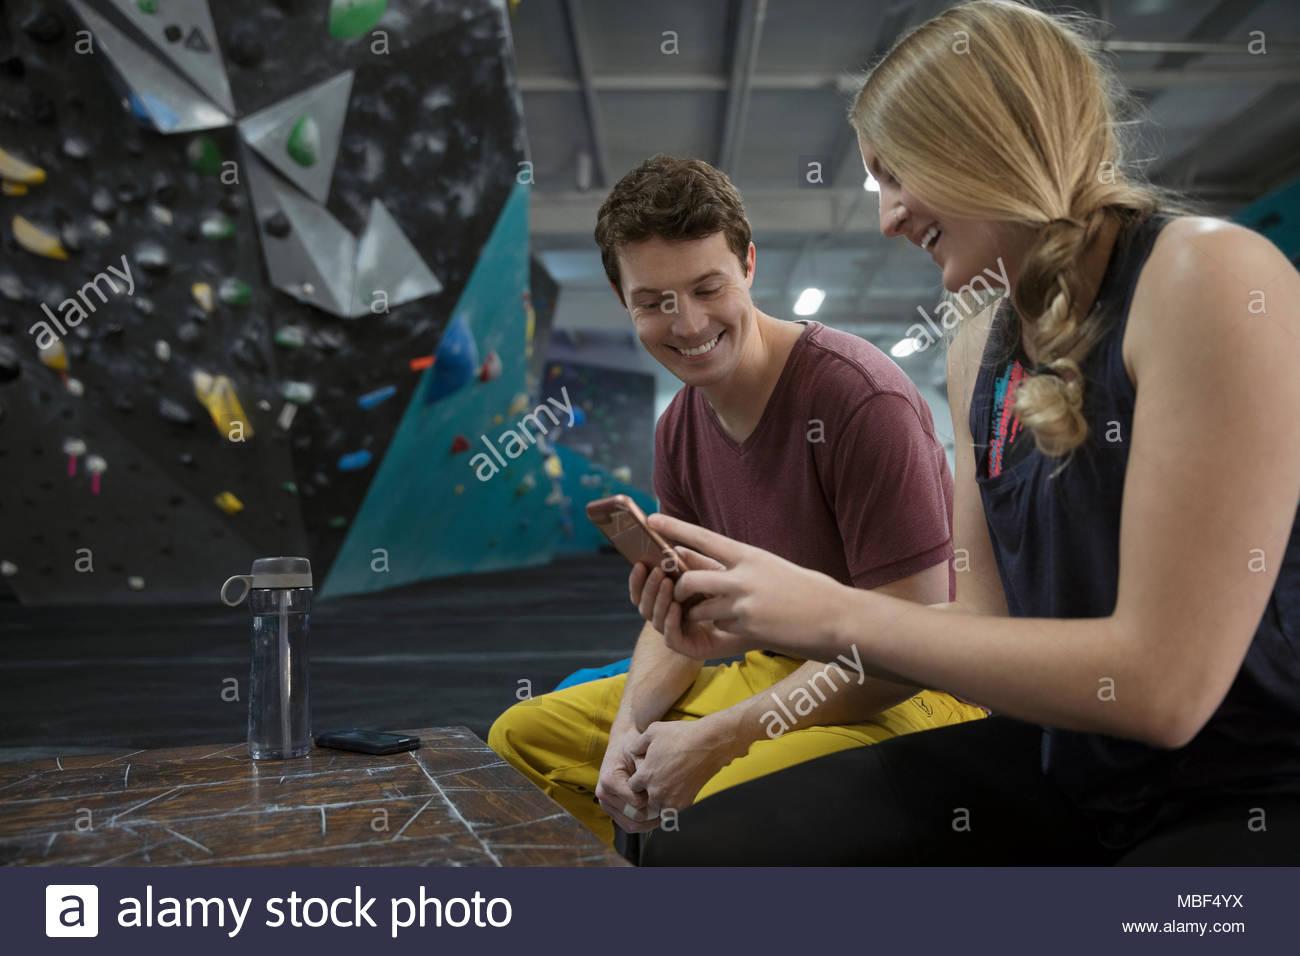 Rock climbers using smart phone at climbing gym Stock Photo